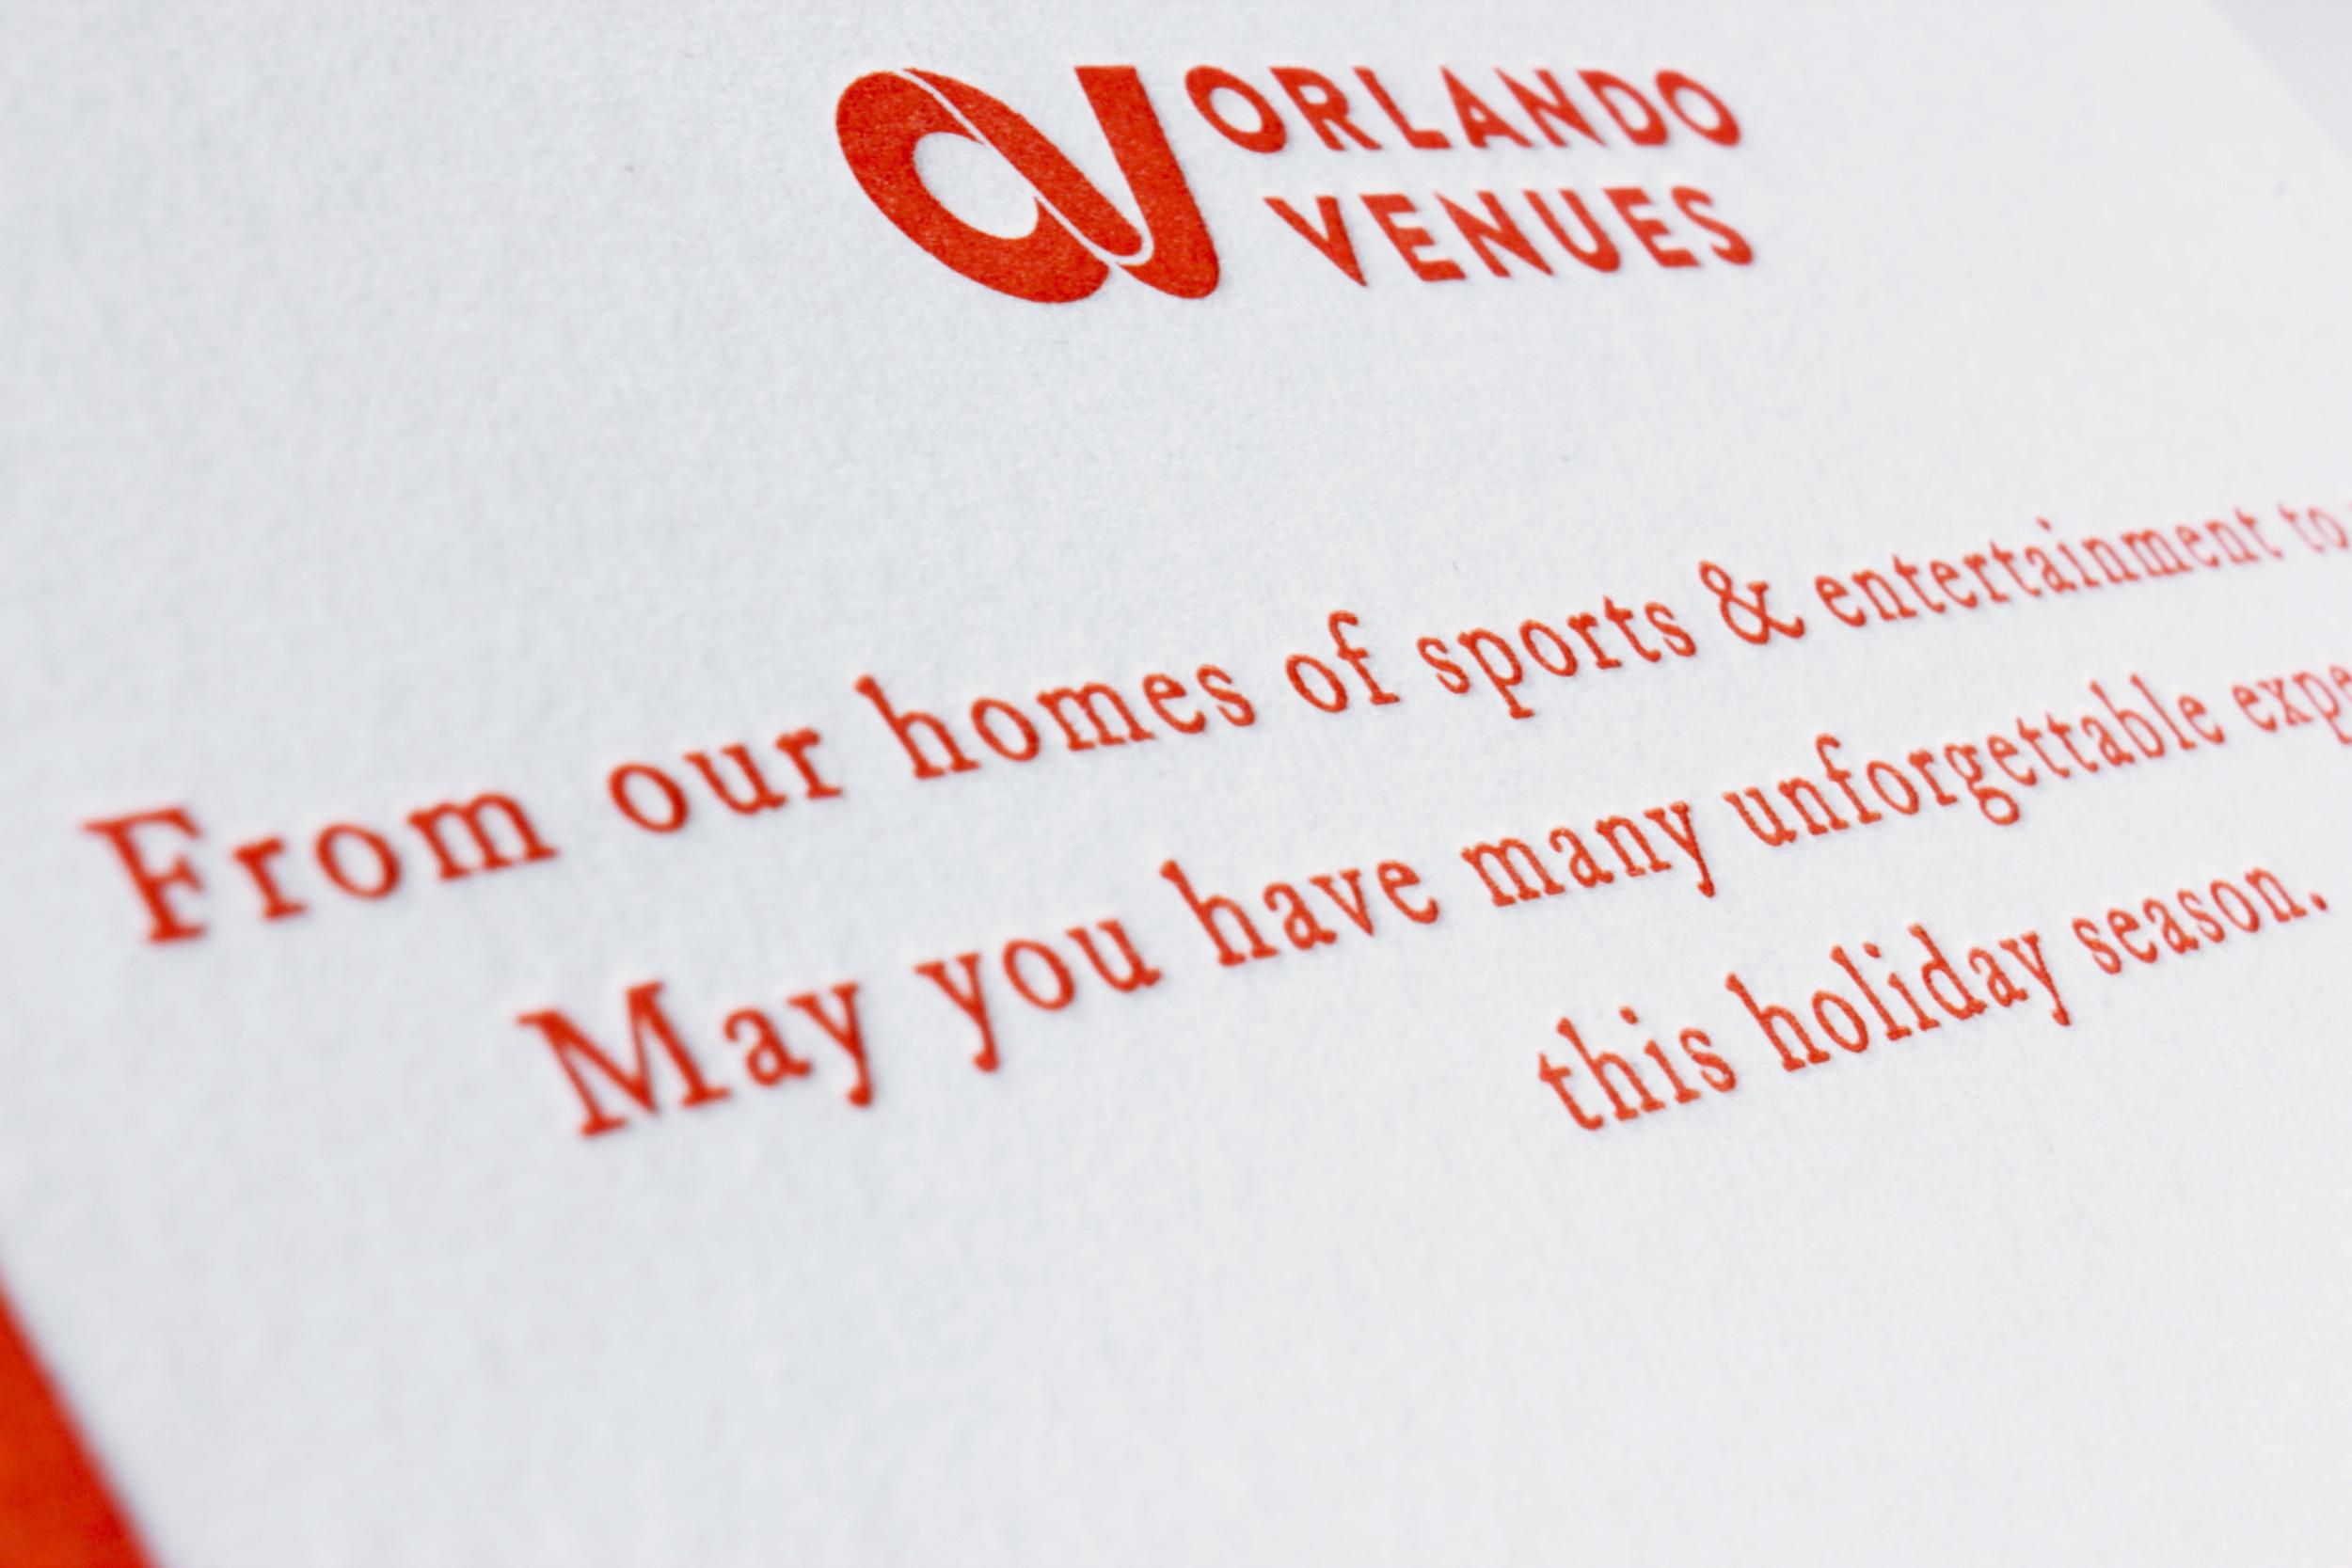 Orlando Venues Letterpressed Holiday Card